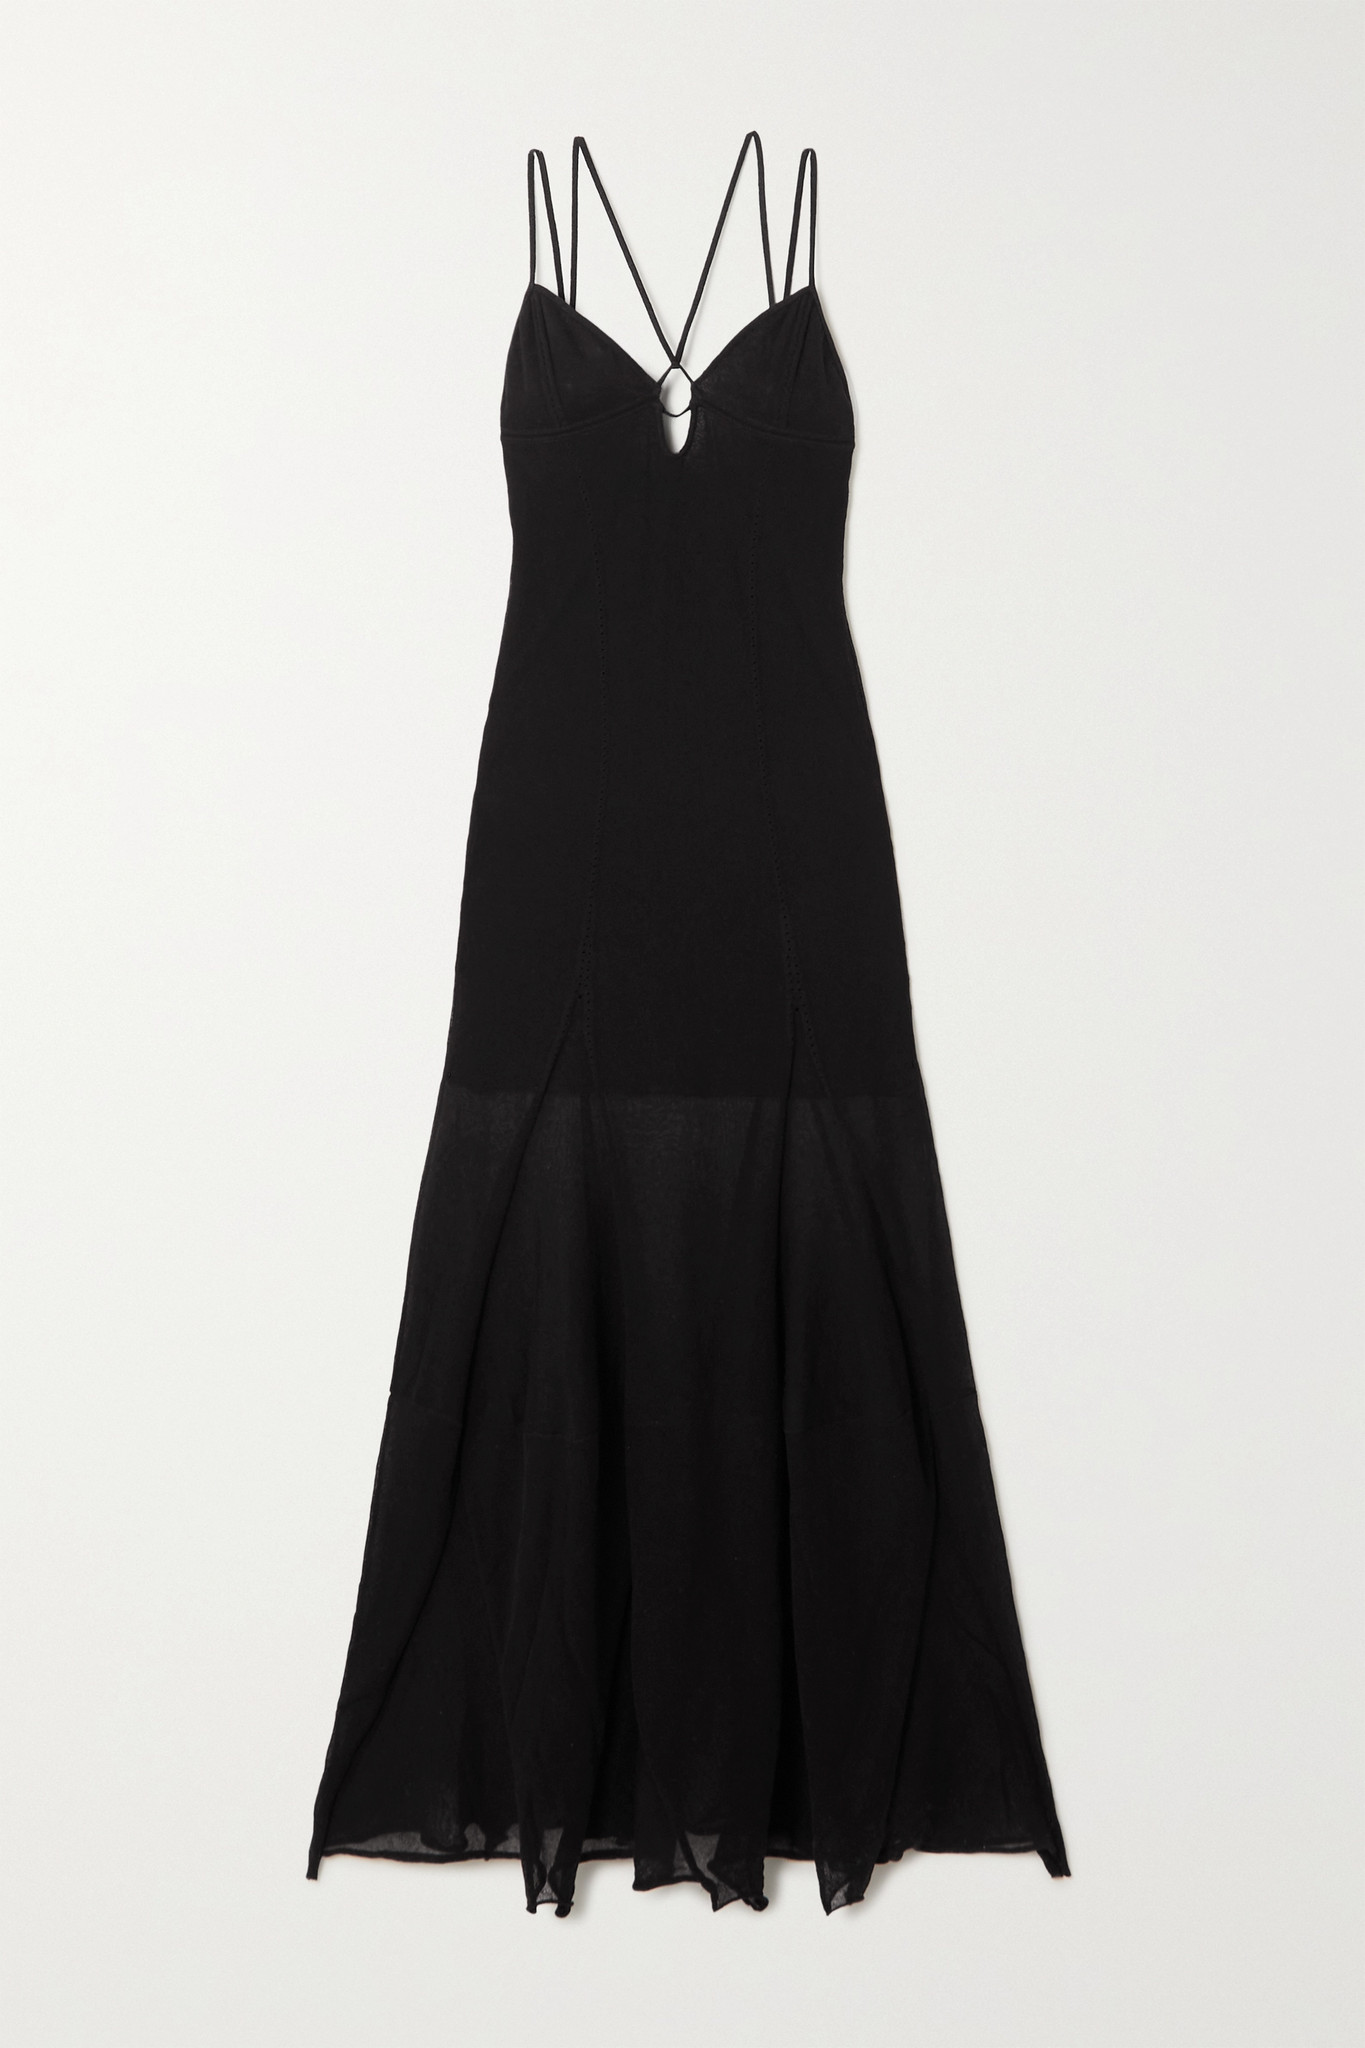 JACQUEMUS - Basgia Cutout Open-knit Organic Cotton-blend Maxi Dress - Black - FR36